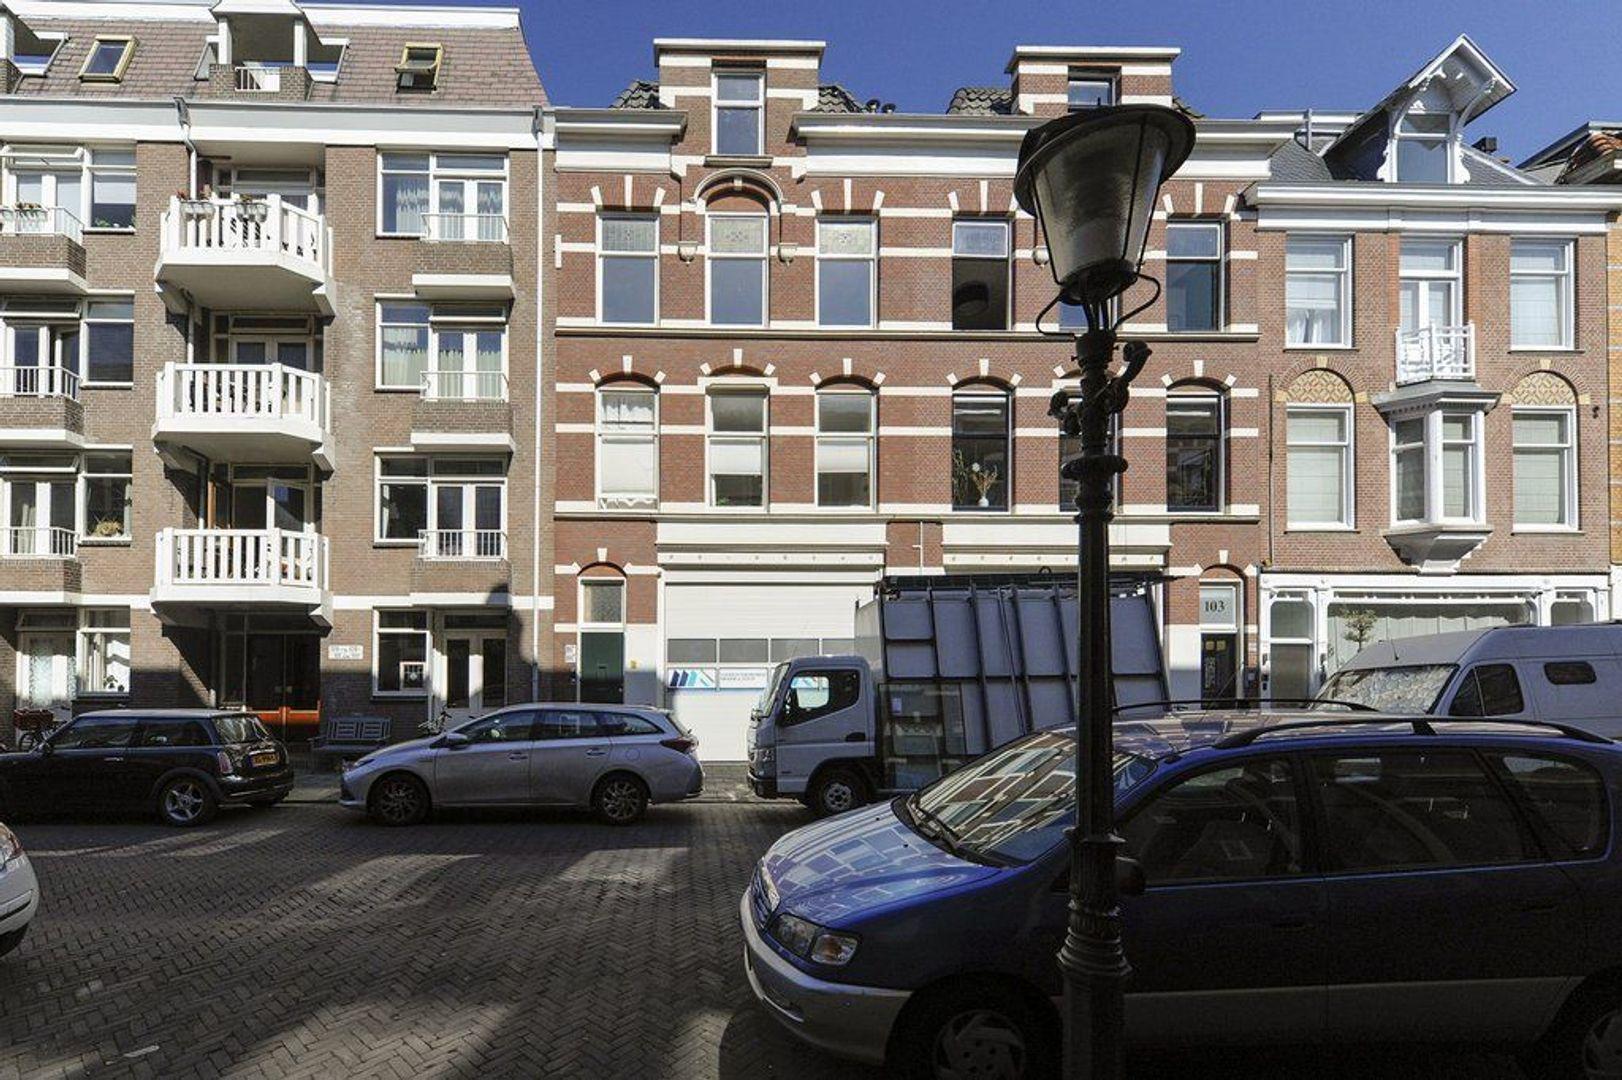 2e Van Blankenburgstraat 107 a, Den Haag foto-29 blur